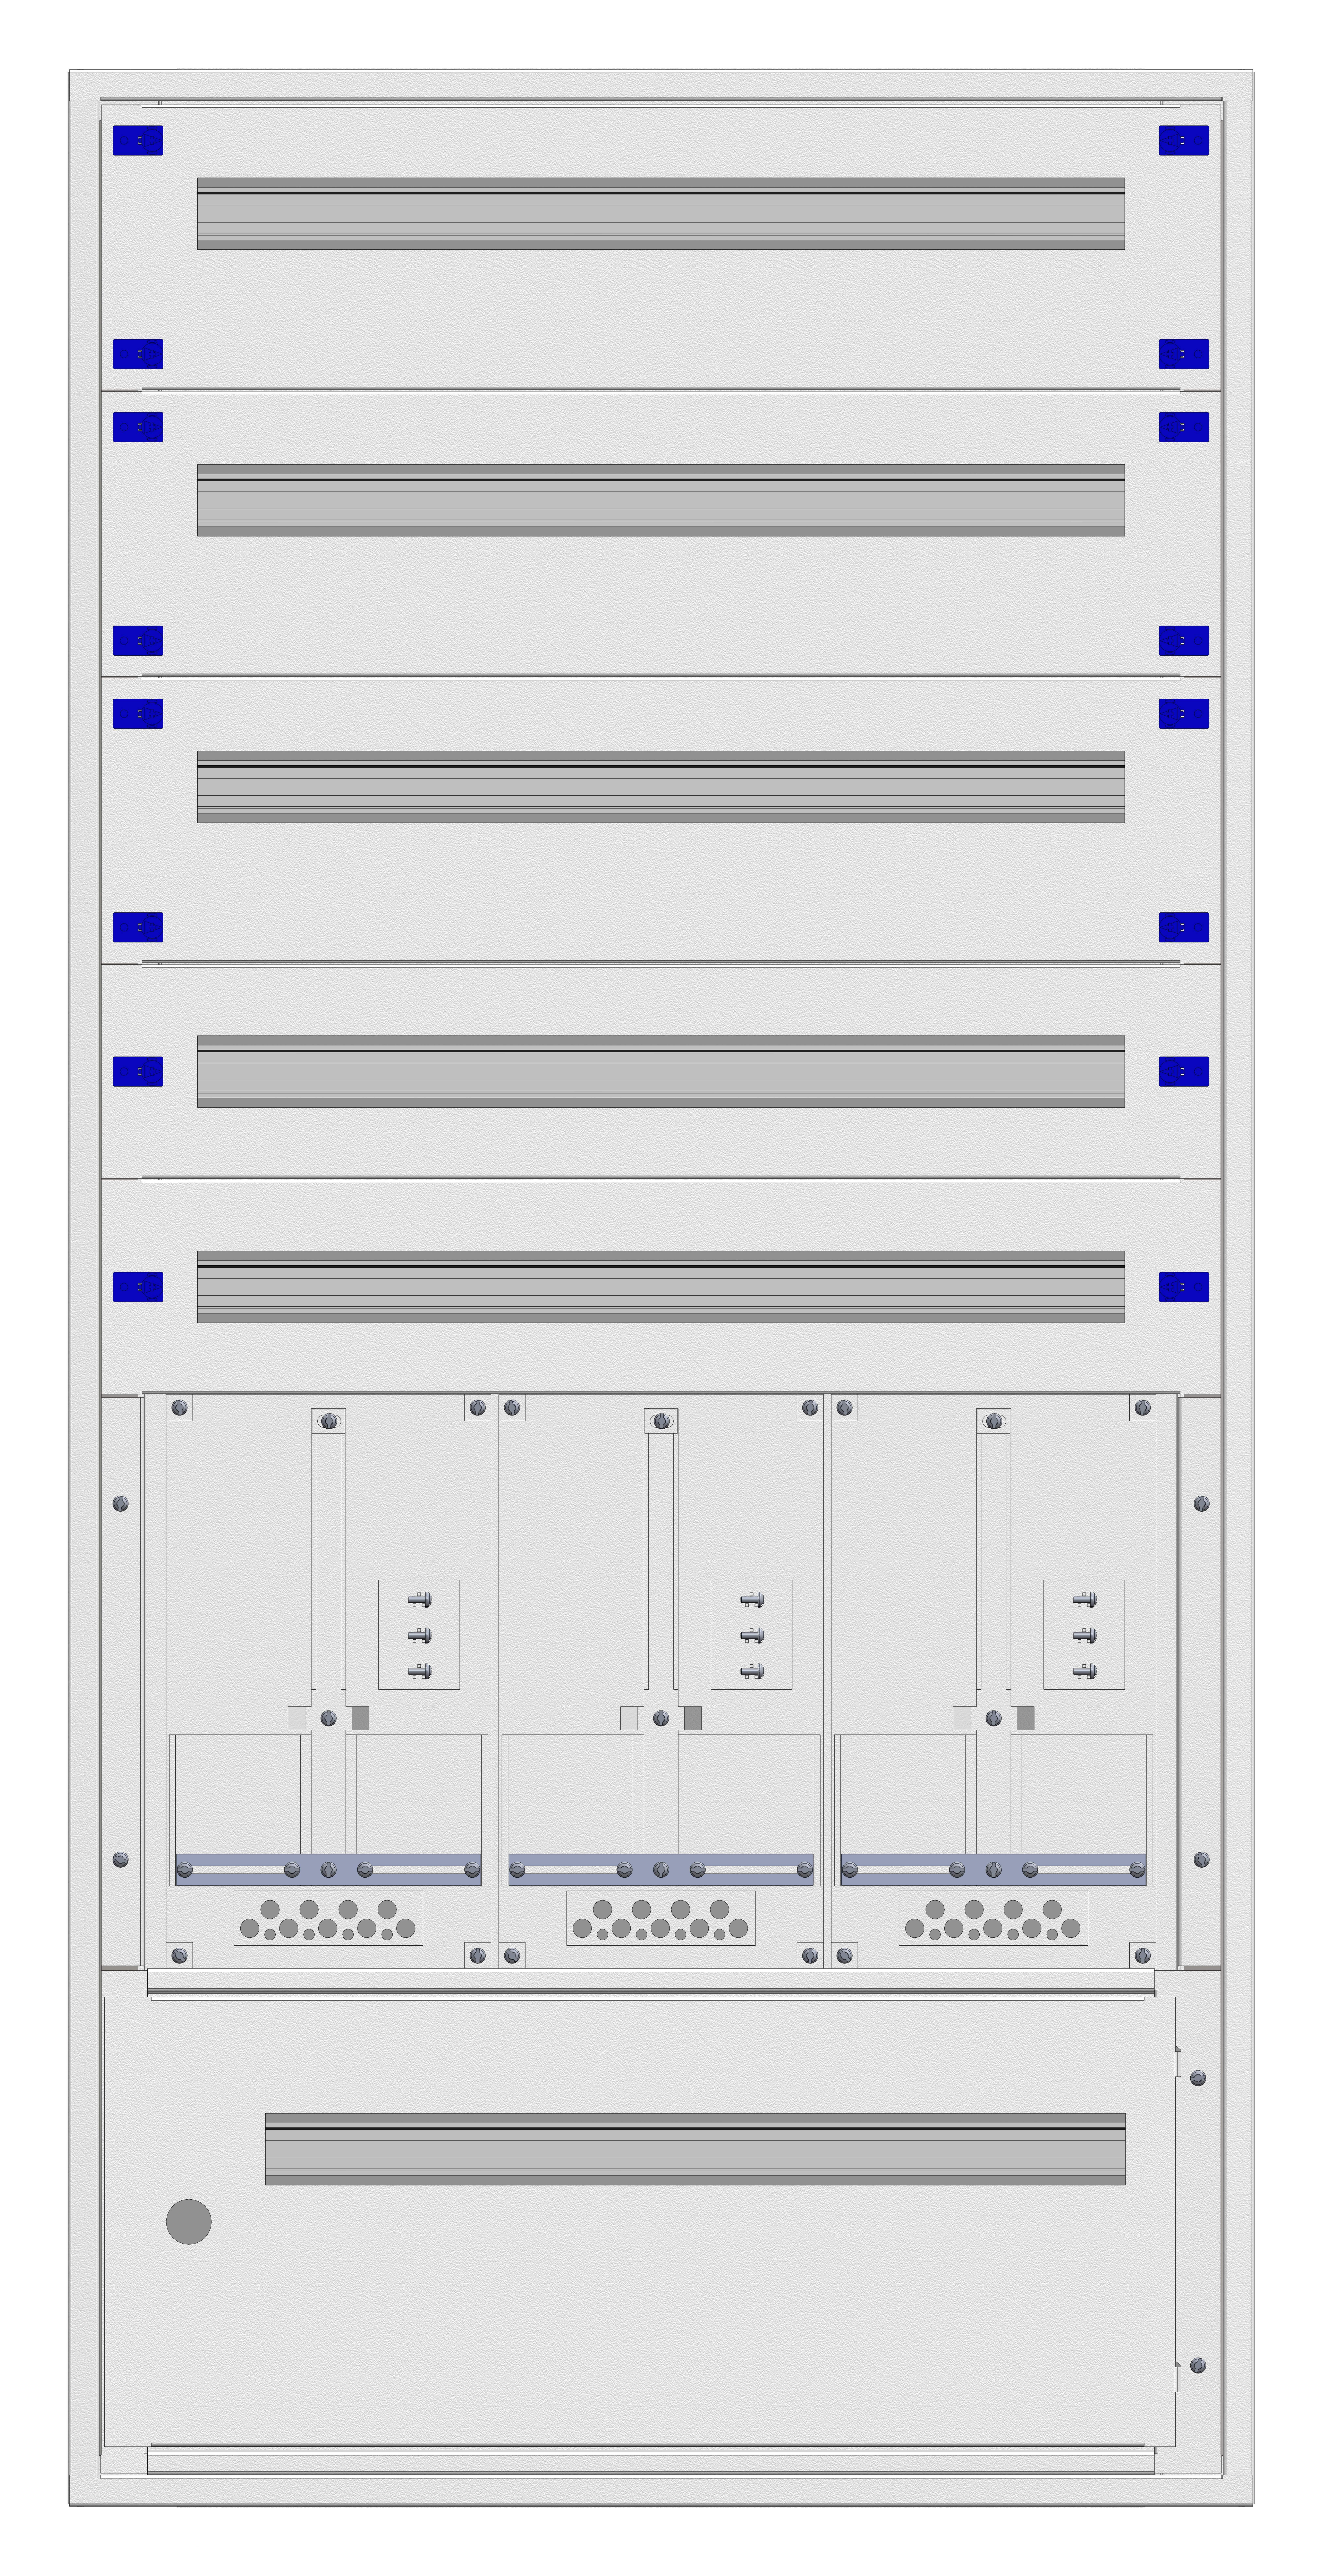 1 Stk Aufputz-Zählerverteiler 3A-33E/STMK 3ZP, H1605B810T250mm IL160333GS